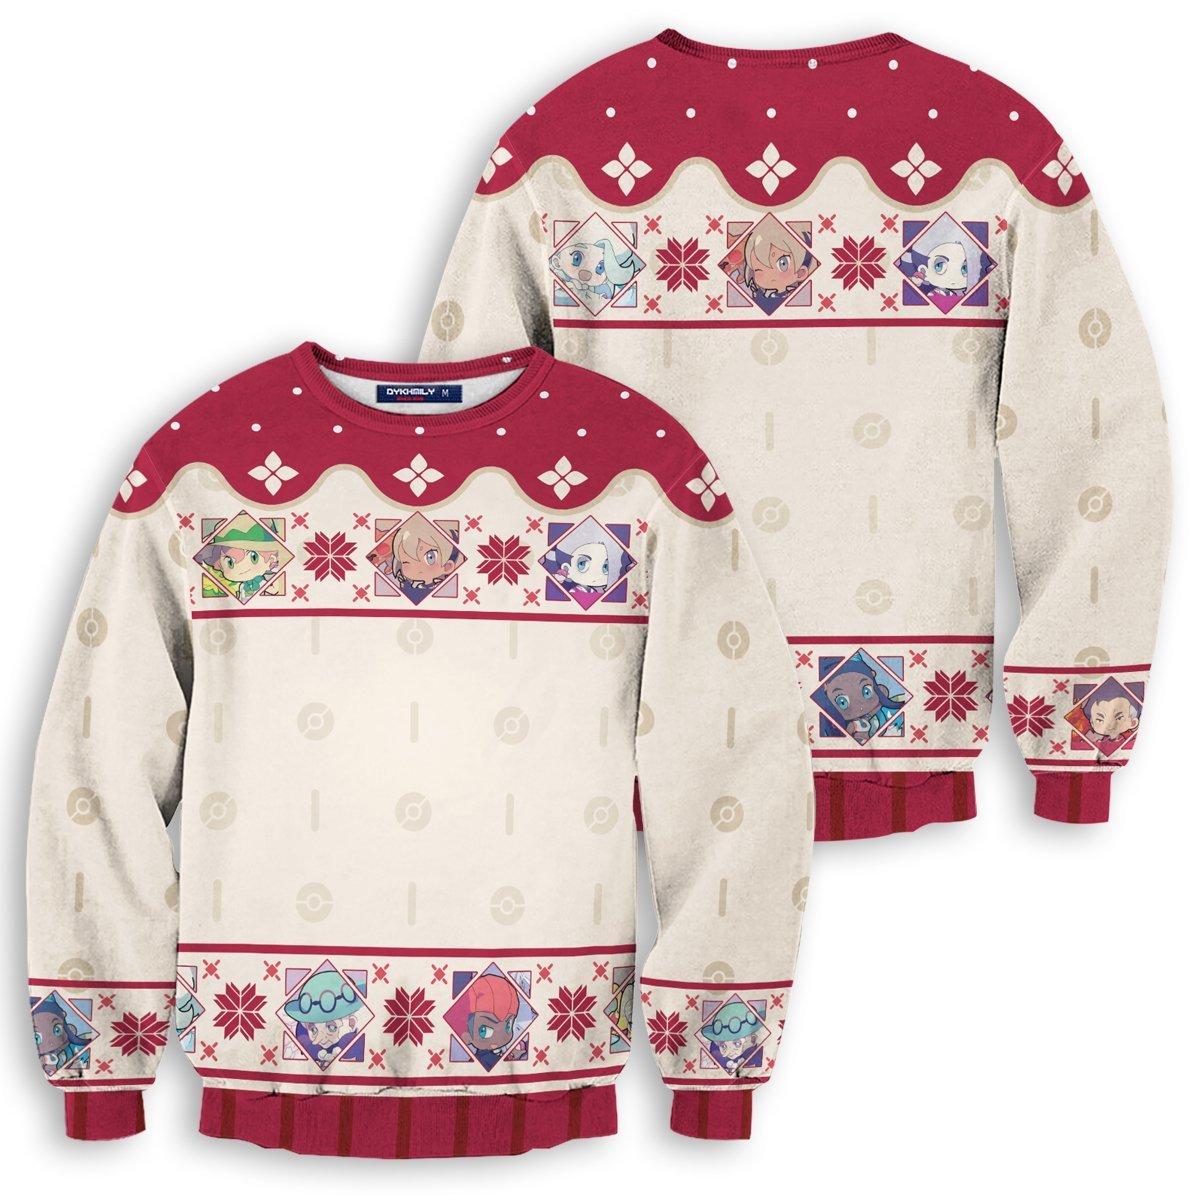 Chibi SS Gym Leaders Unisex Wool Sweater FDM0310 S Official Otaku Treat Merch